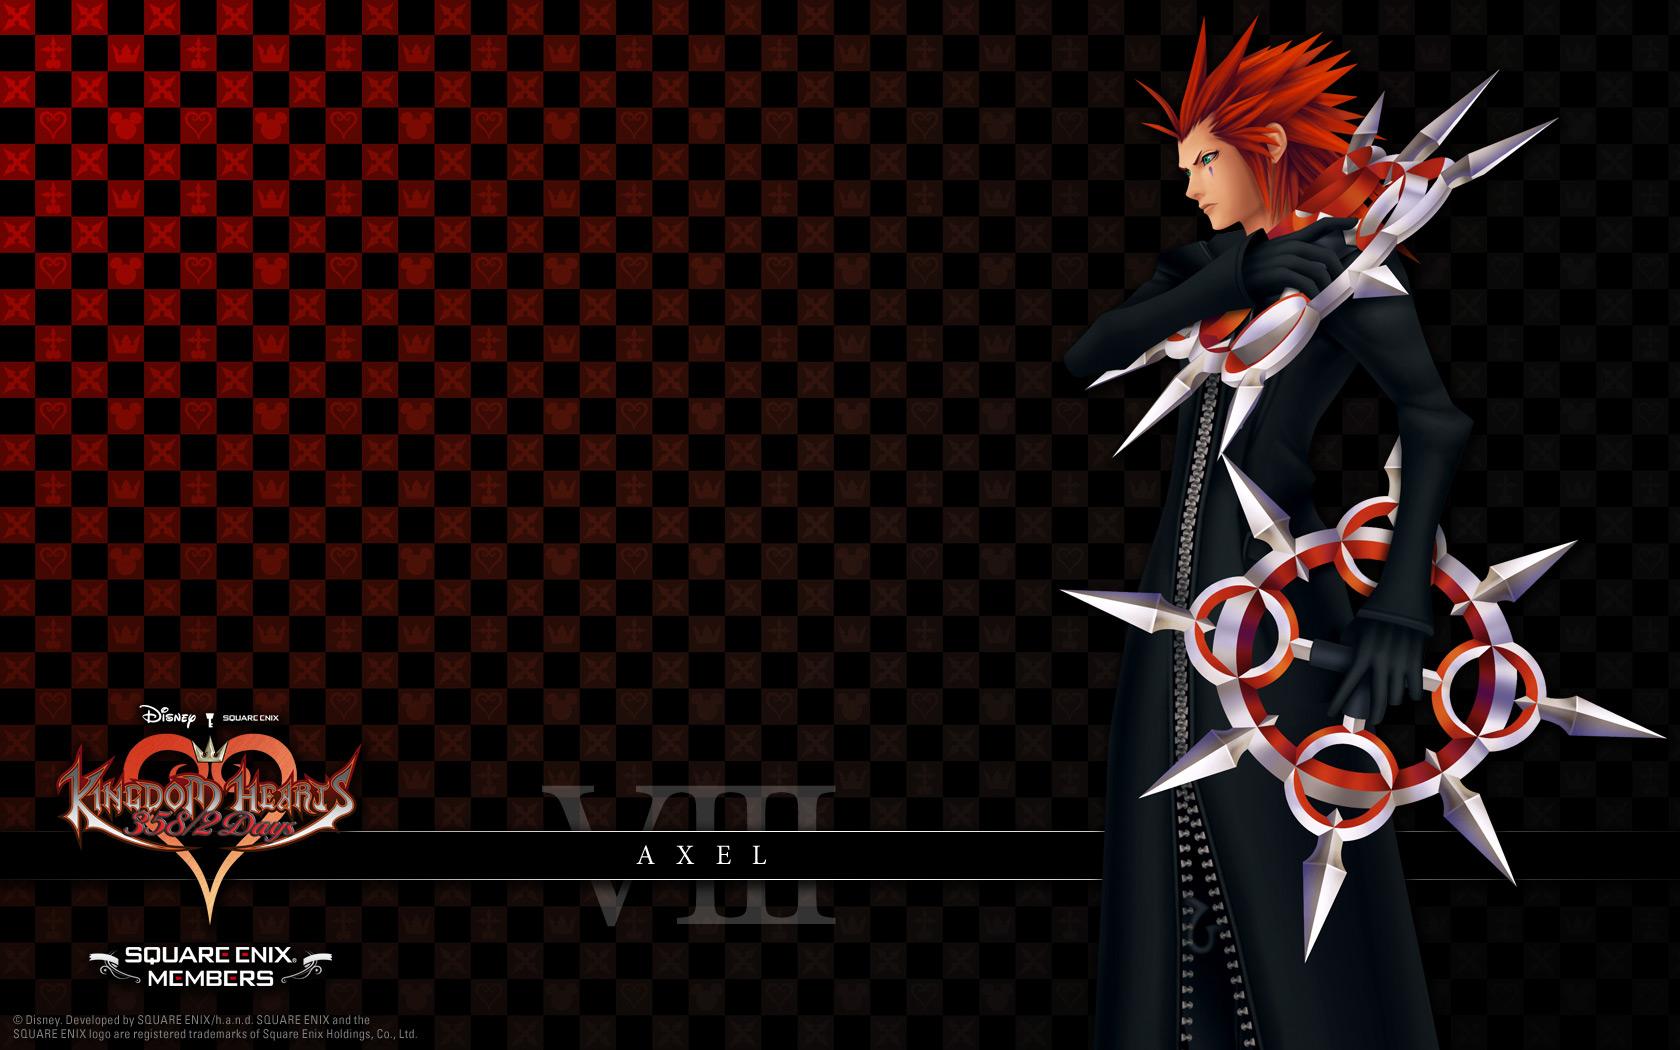 Organization Xiii Members Imagen Kingdom Hearts 358 2 Days Organization 13 Member Viii Axel Kingdom Hearts Kingdom Hearts Wallpaper Kingdom Hearts Hd